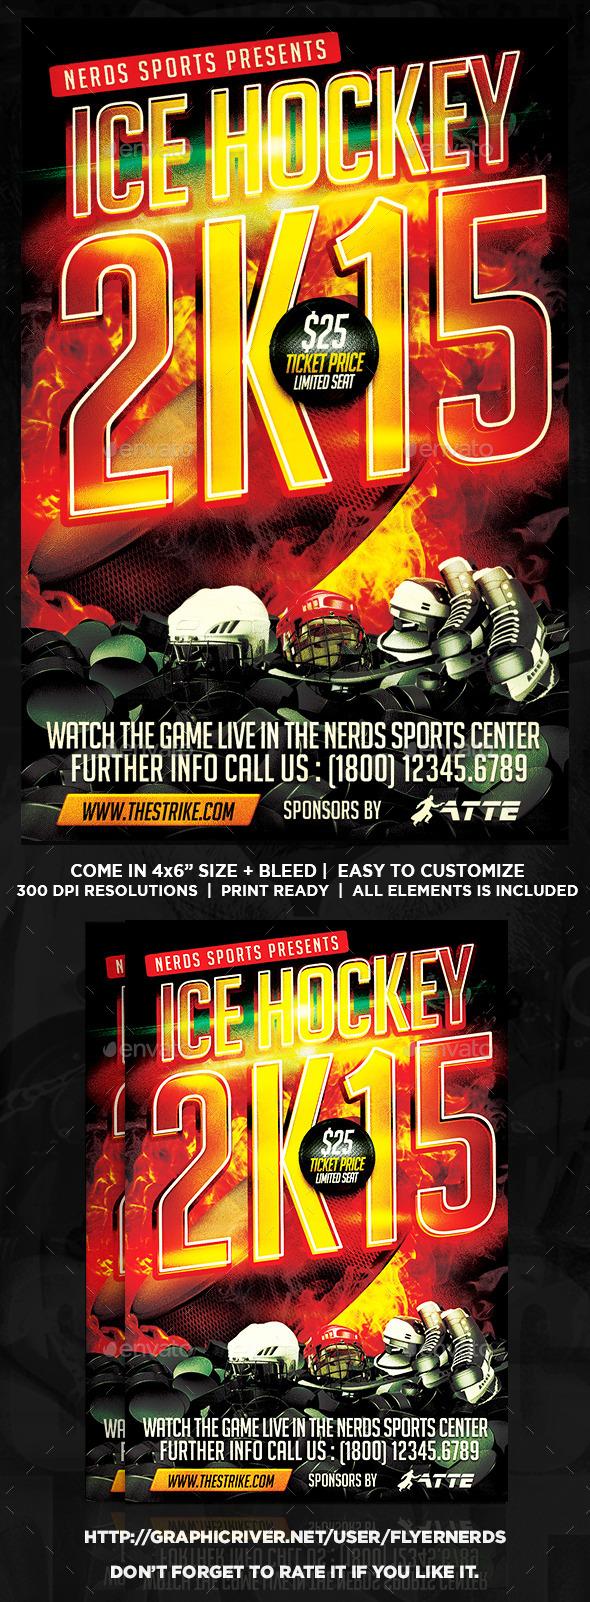 GraphicRiver Ice Hockey 2K15 Championships Flyer 9907031